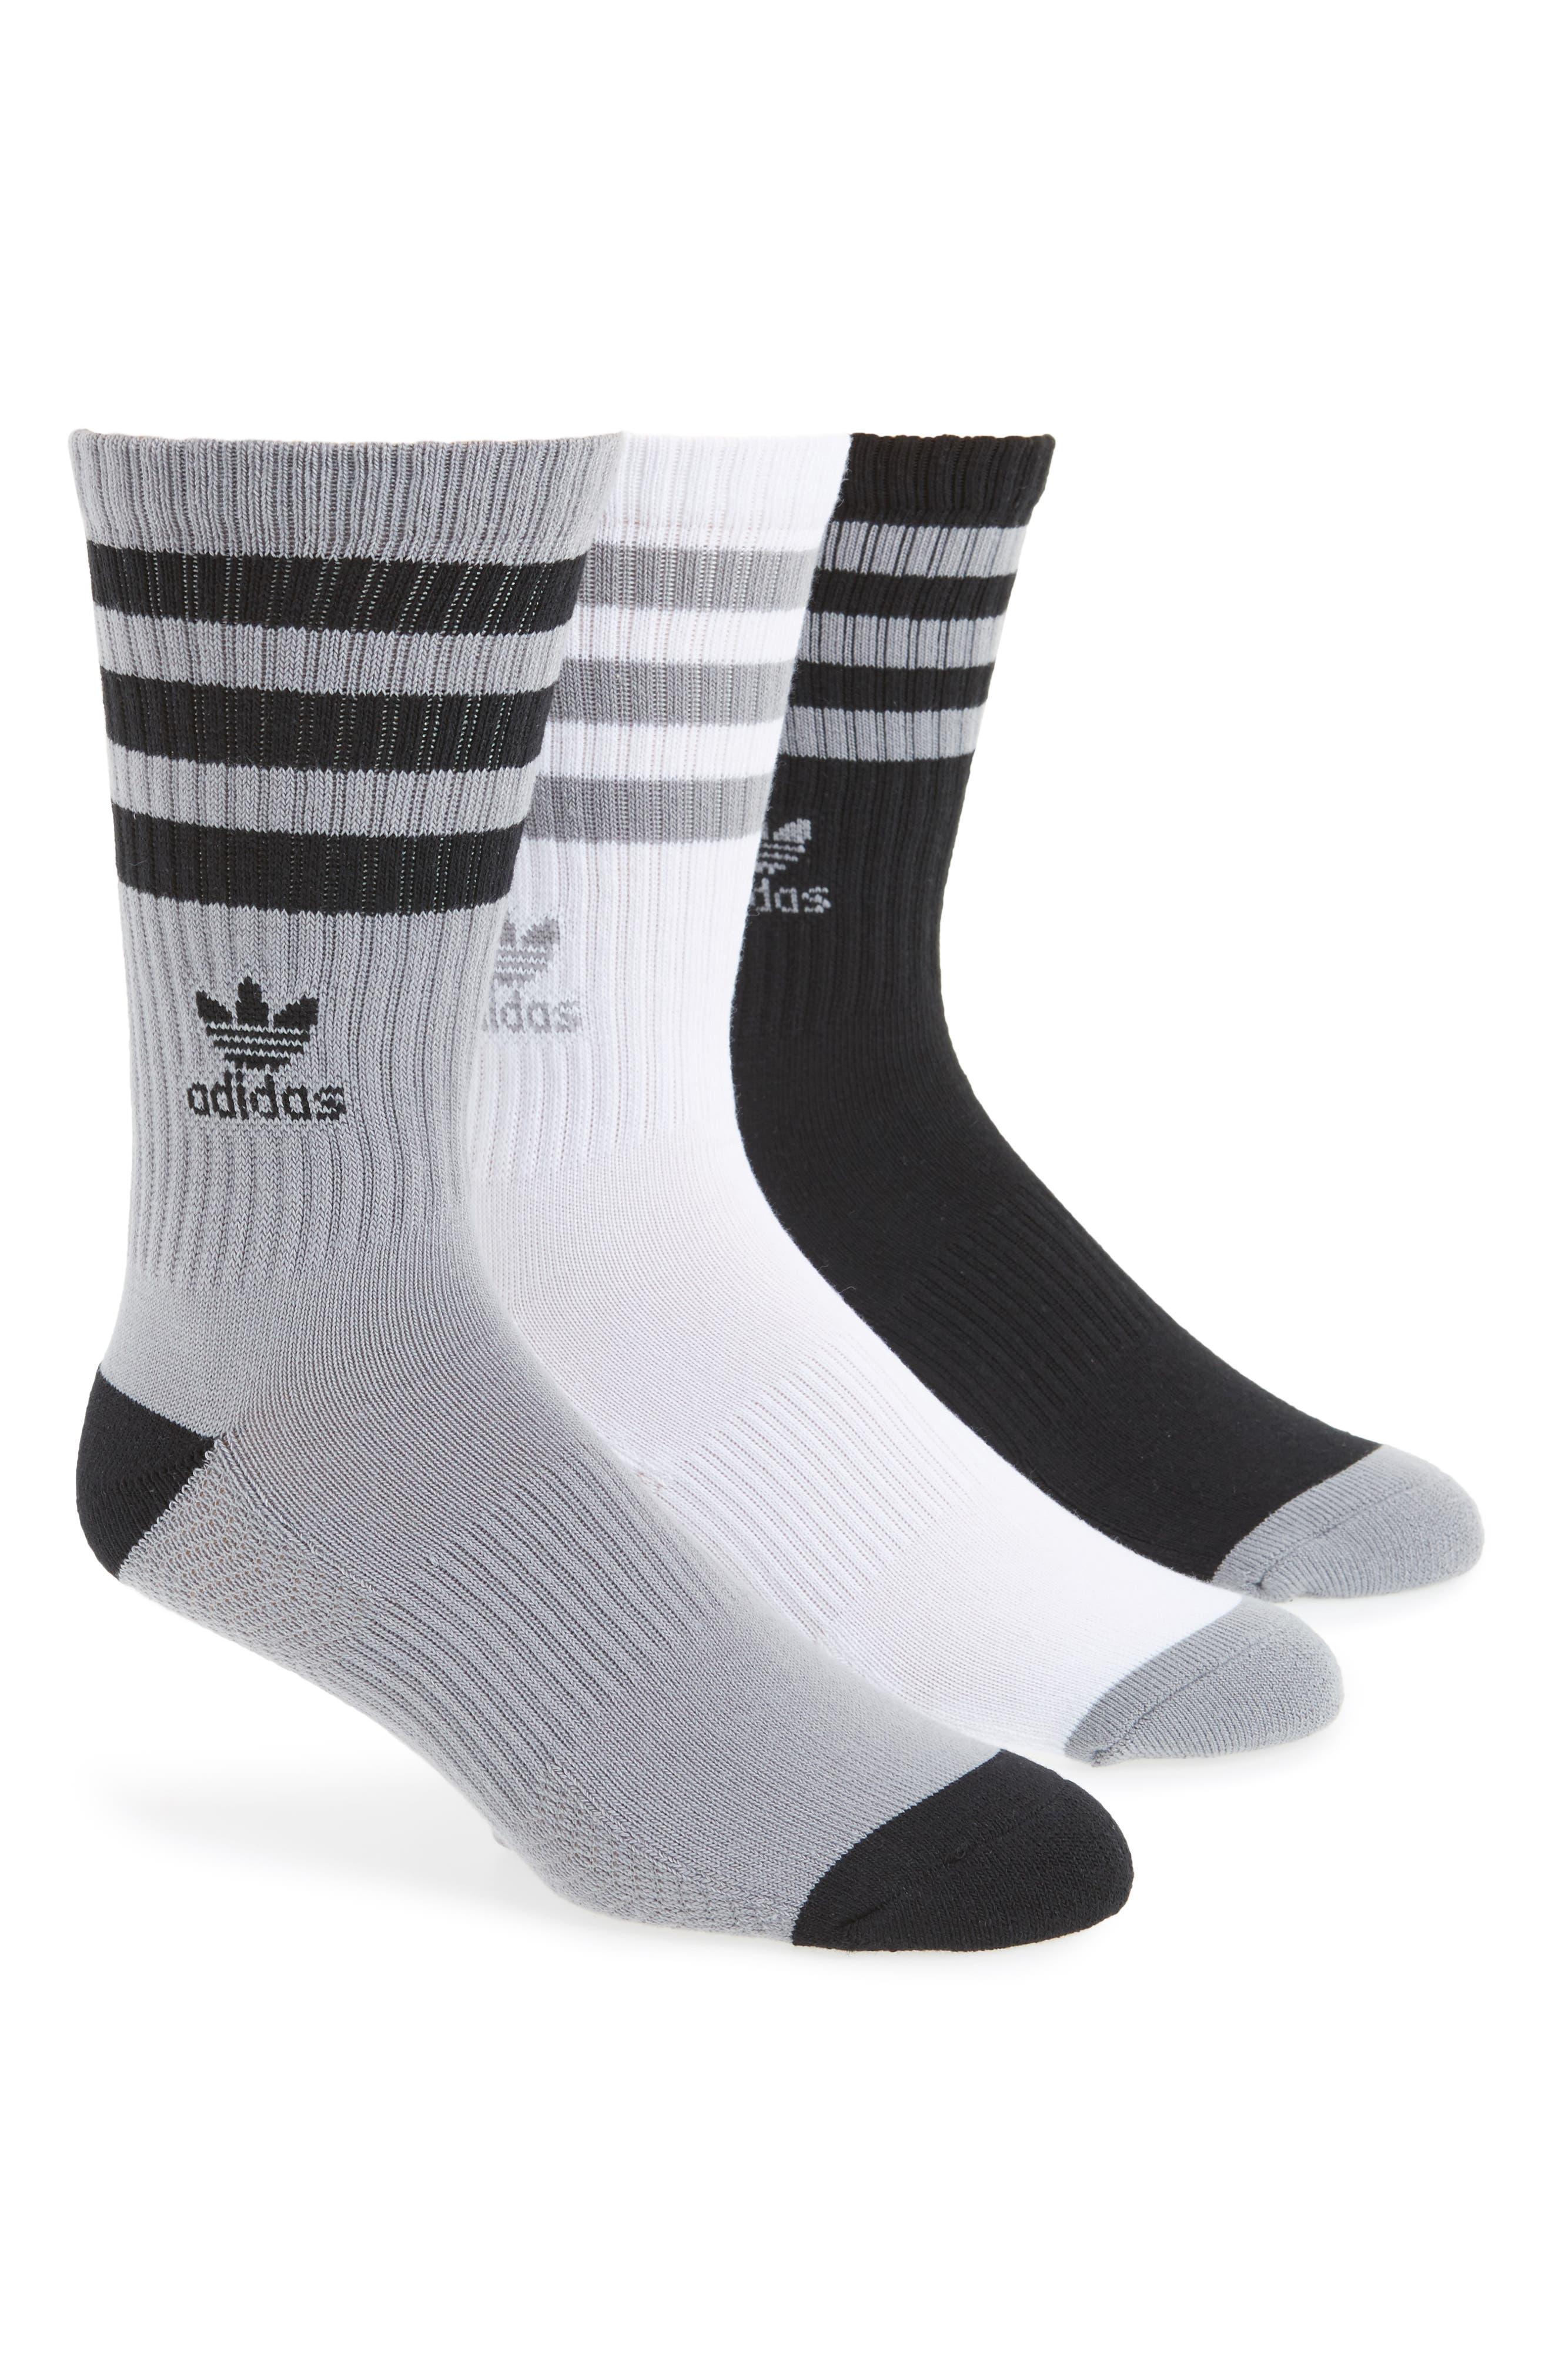 ADIDAS ORIGINALS 3-Pack Ribbed Crew Socks, Main, color, LIGHT ONYX/ BLACK/ WHITE